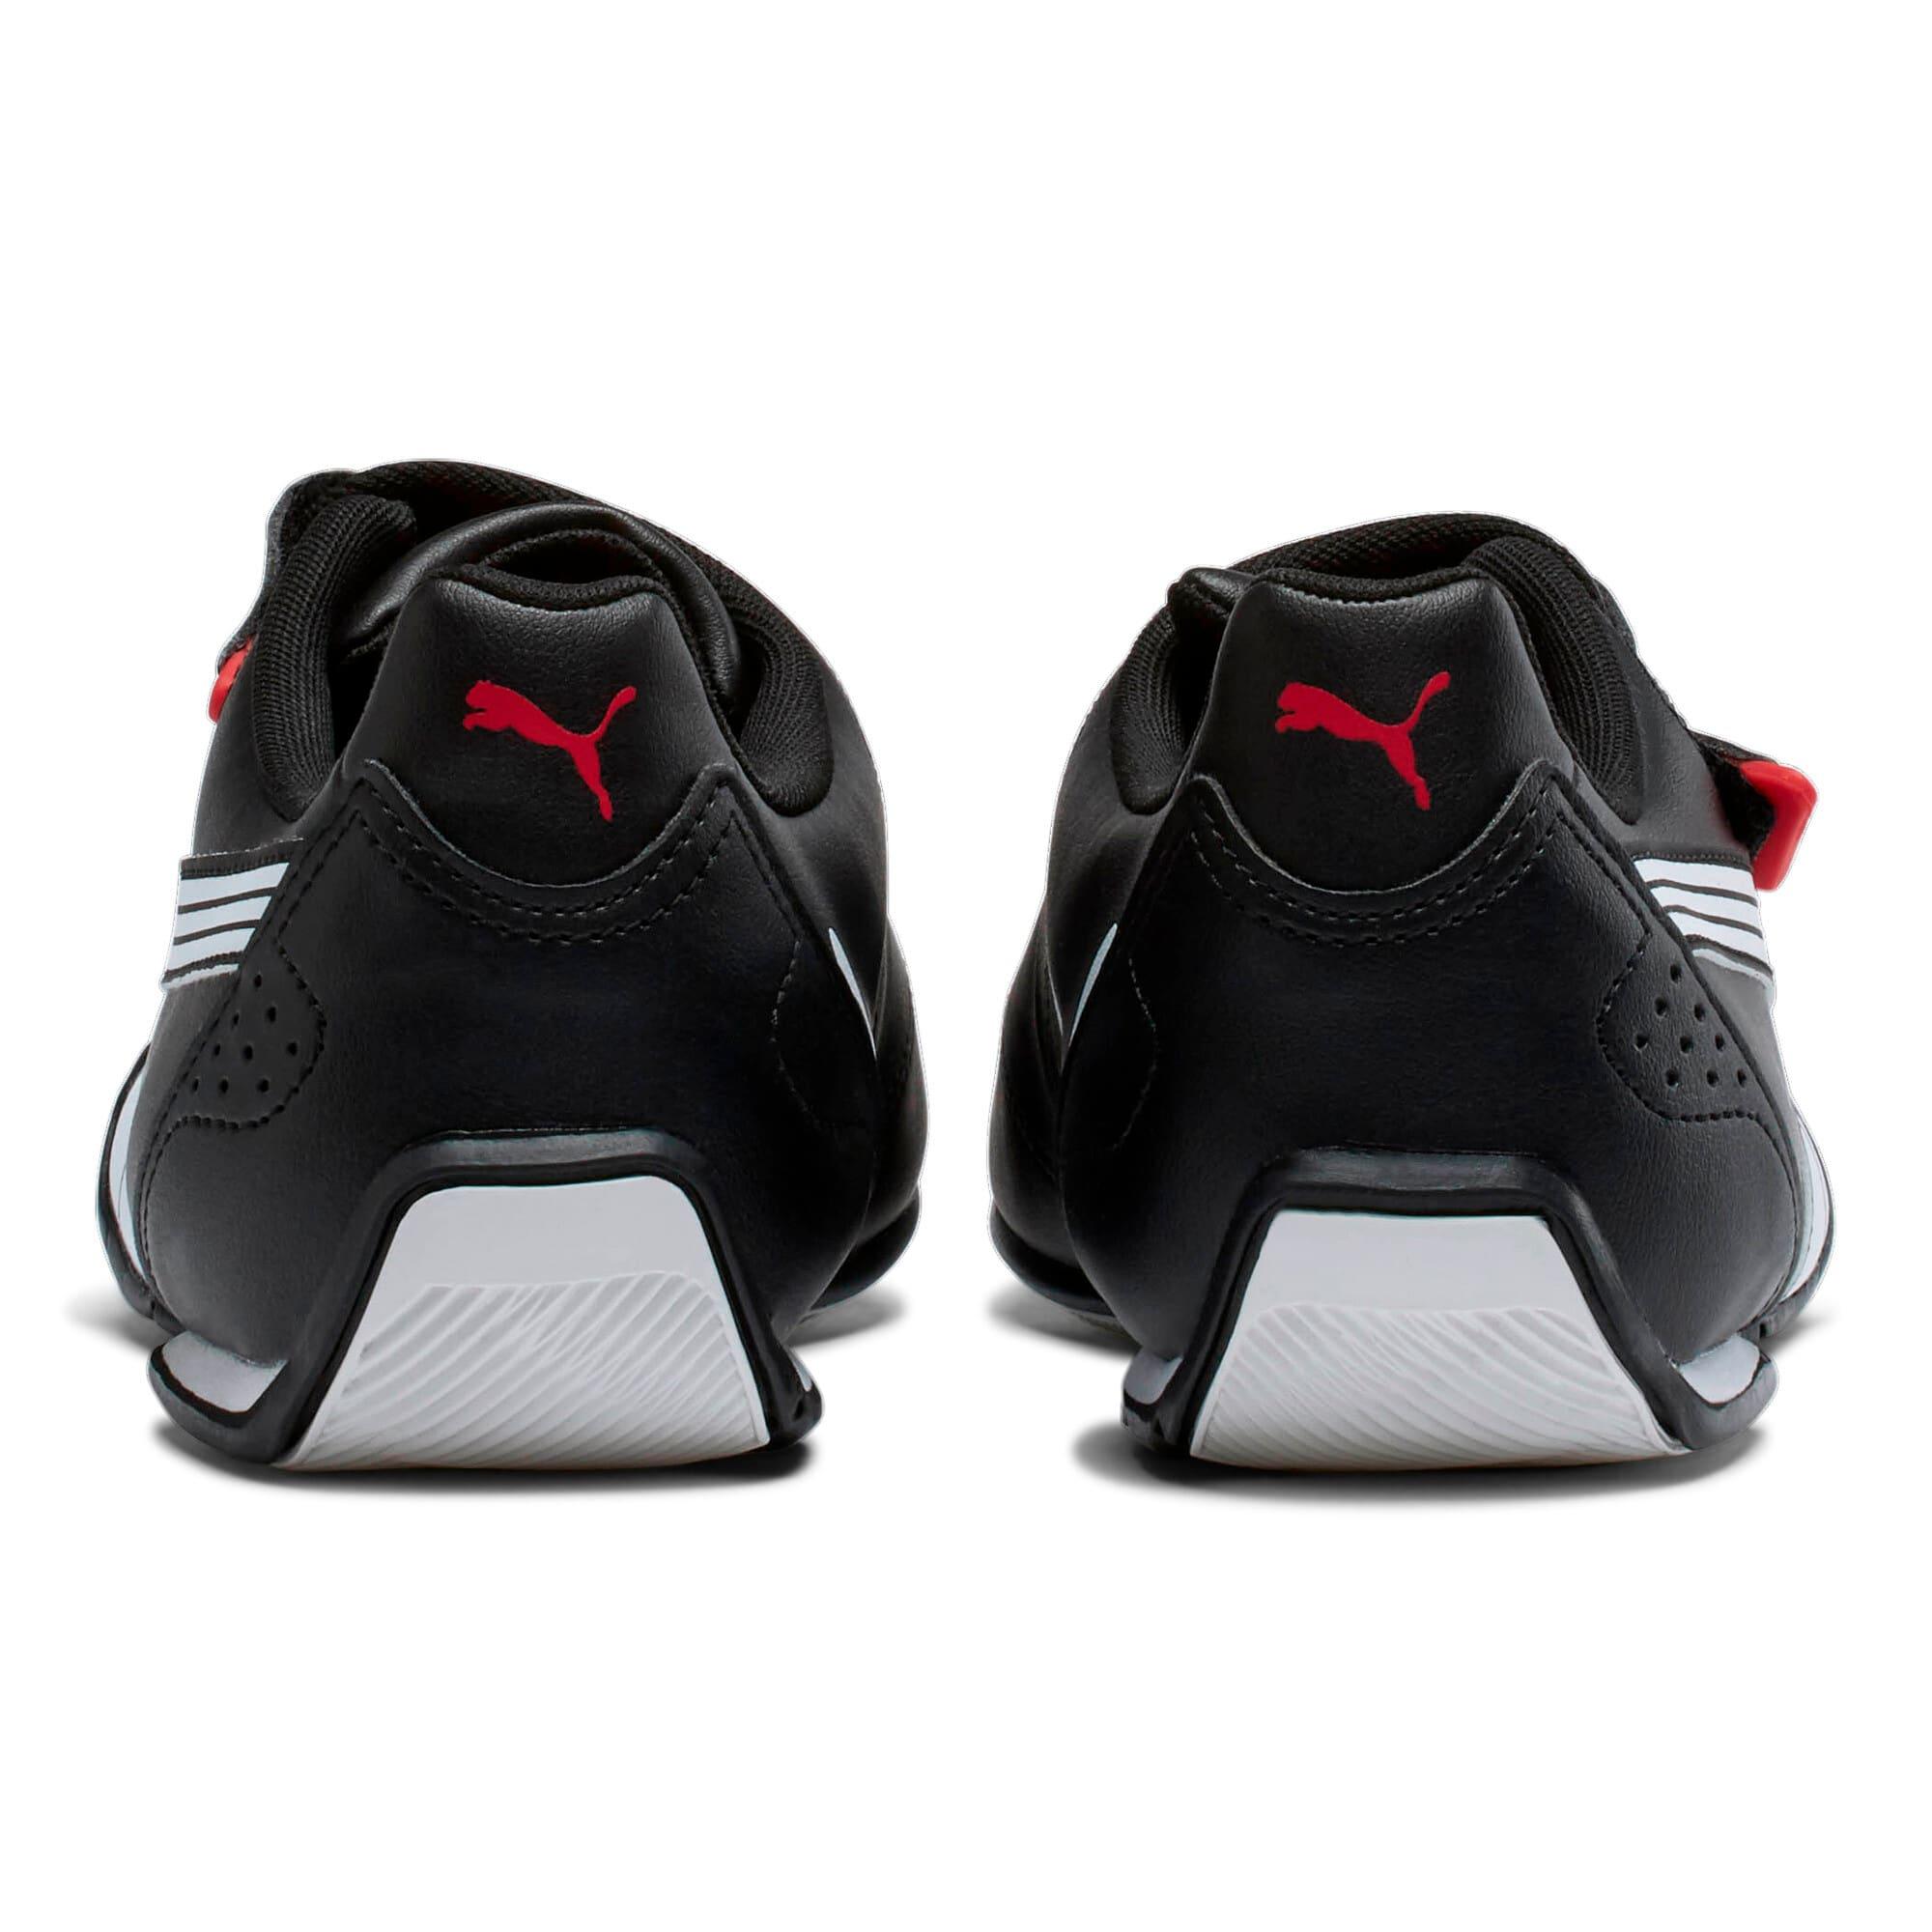 New Puma redon move mens shoe black red white 185999 02